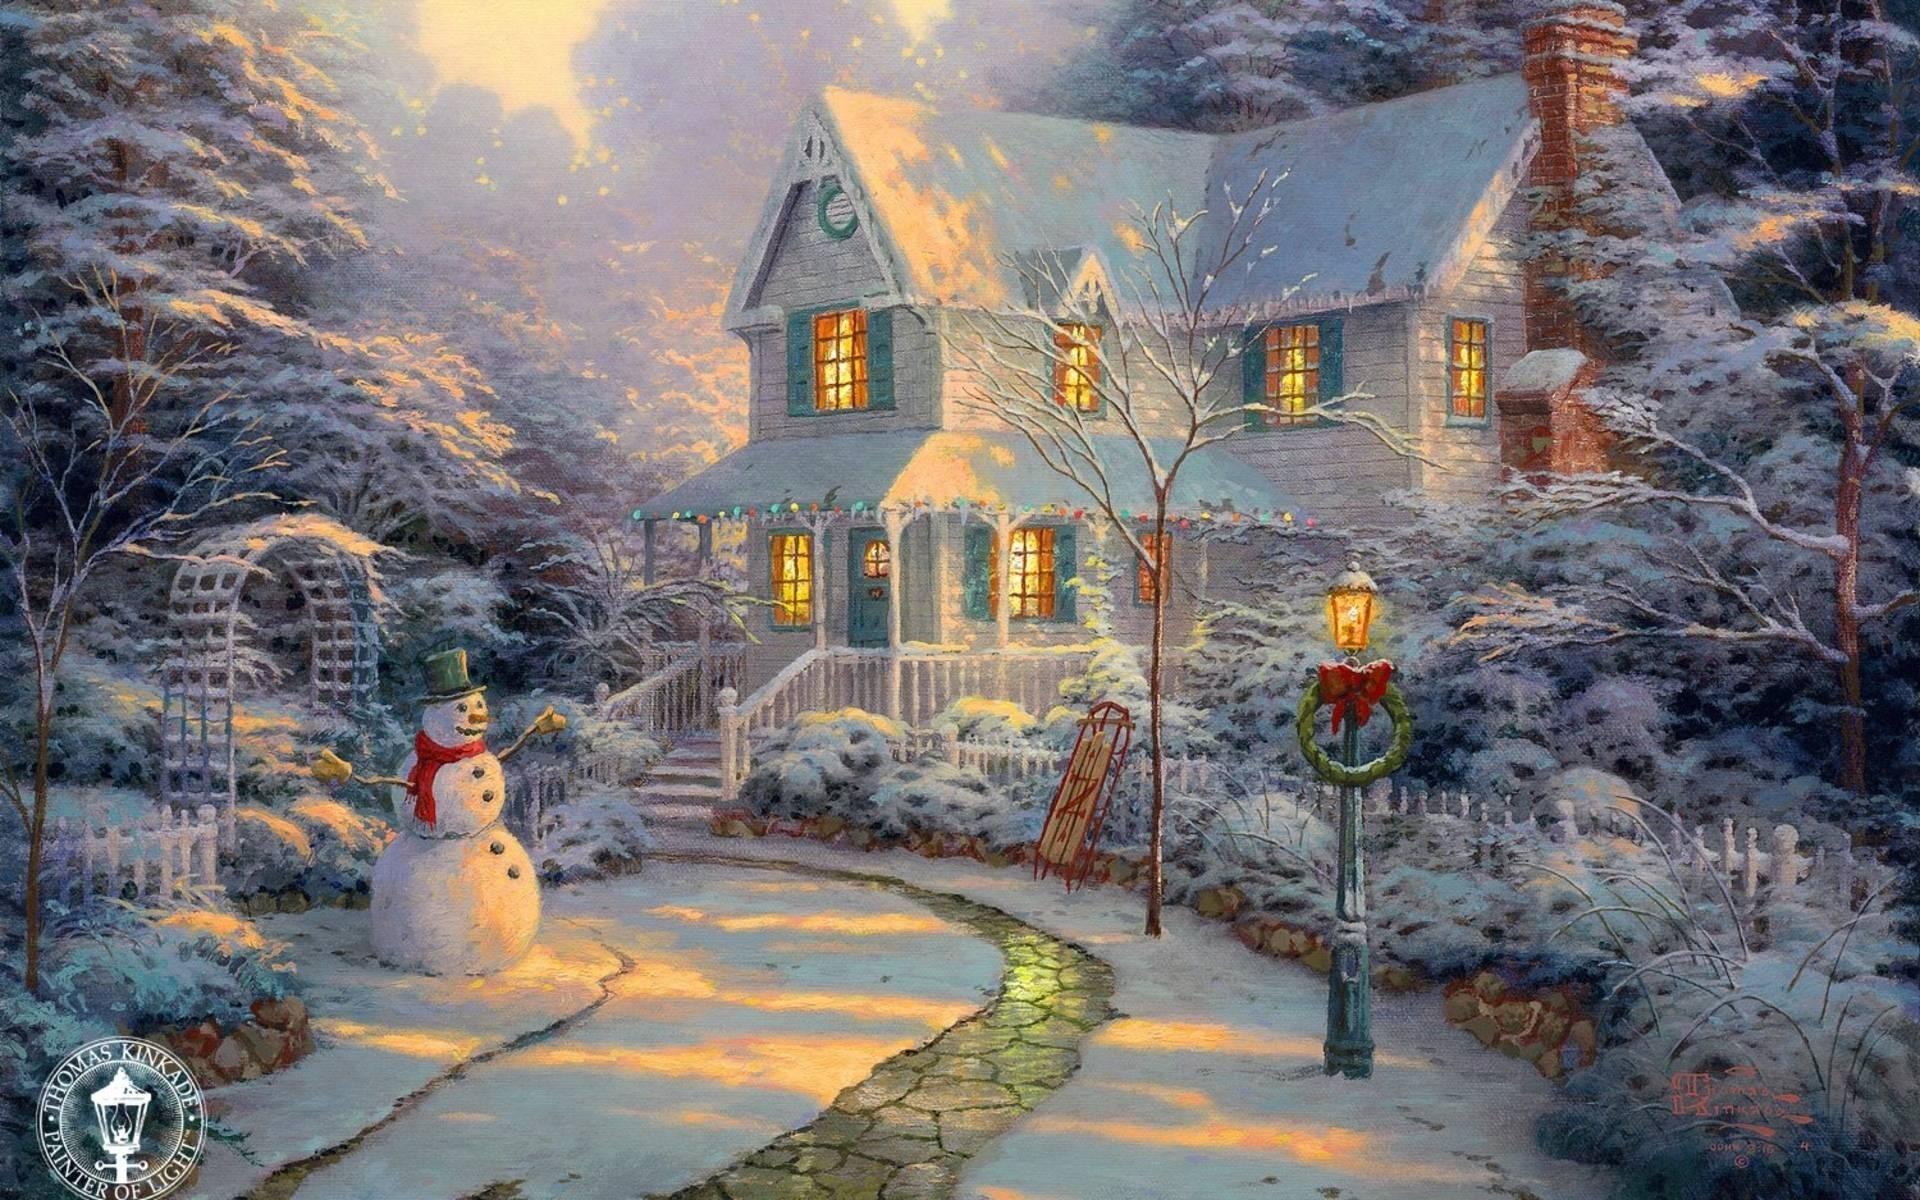 10 Top Thomas Kinkade Christmas Wallpaper Desktop FULL HD 1080p For PC Background